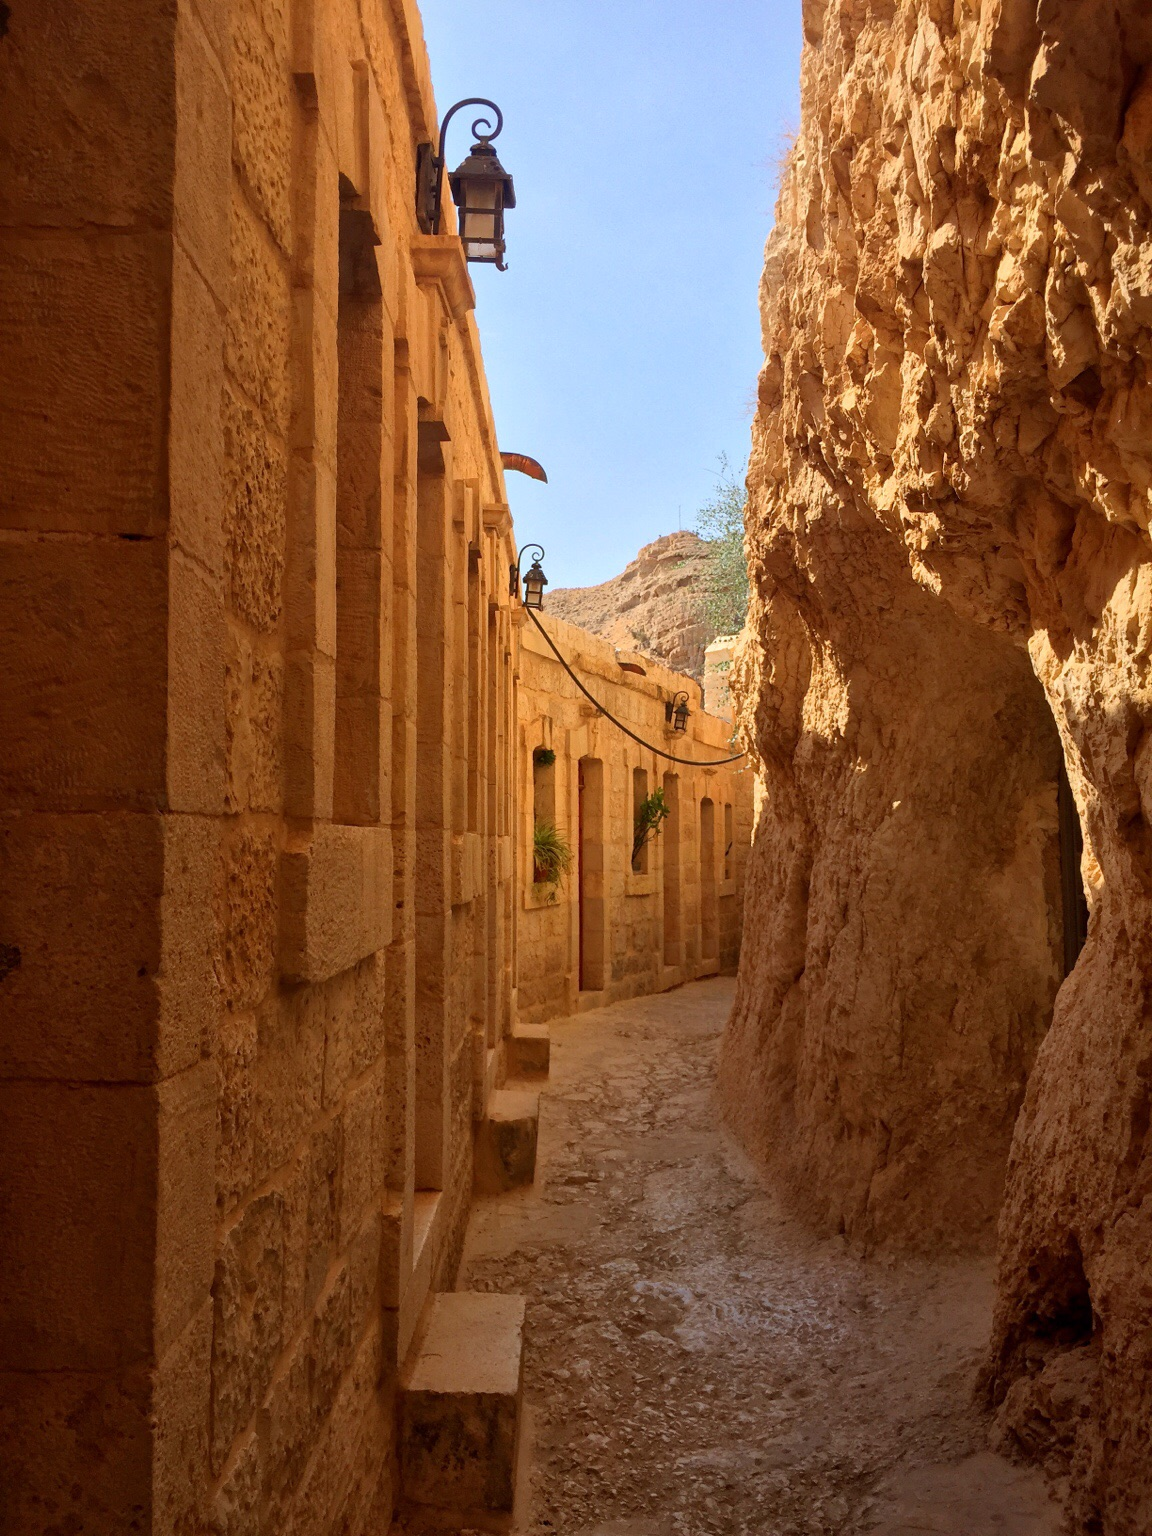 Narrow passages.